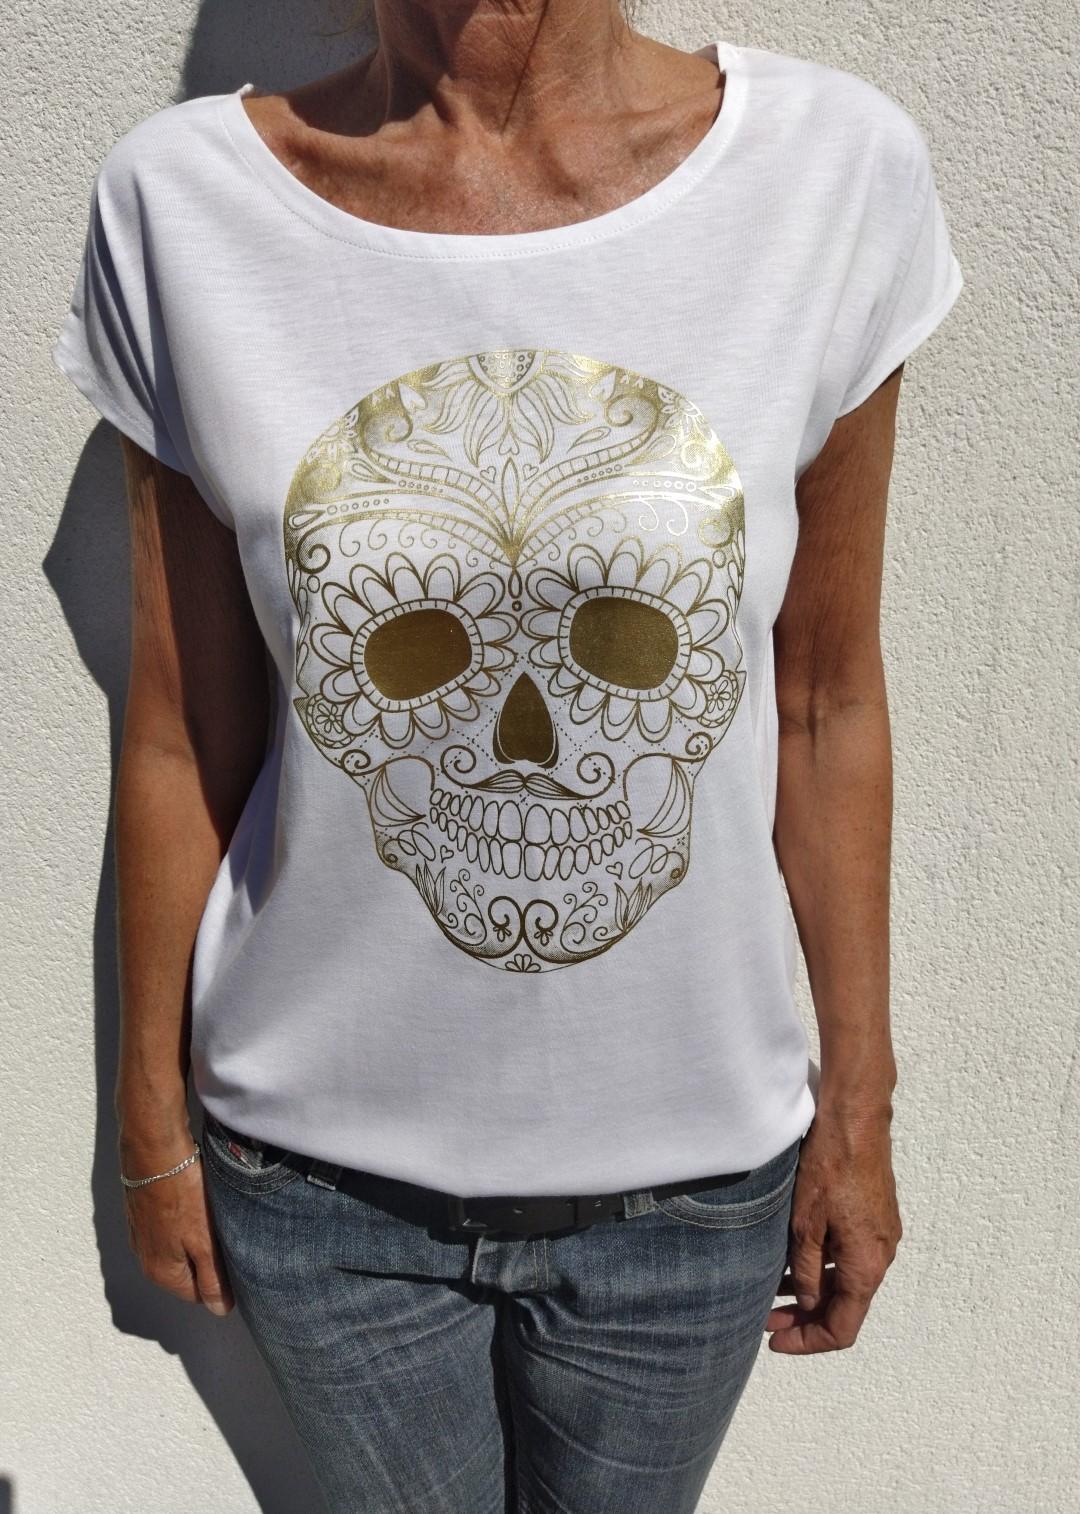 Tee shirt blanc N°55 skull or